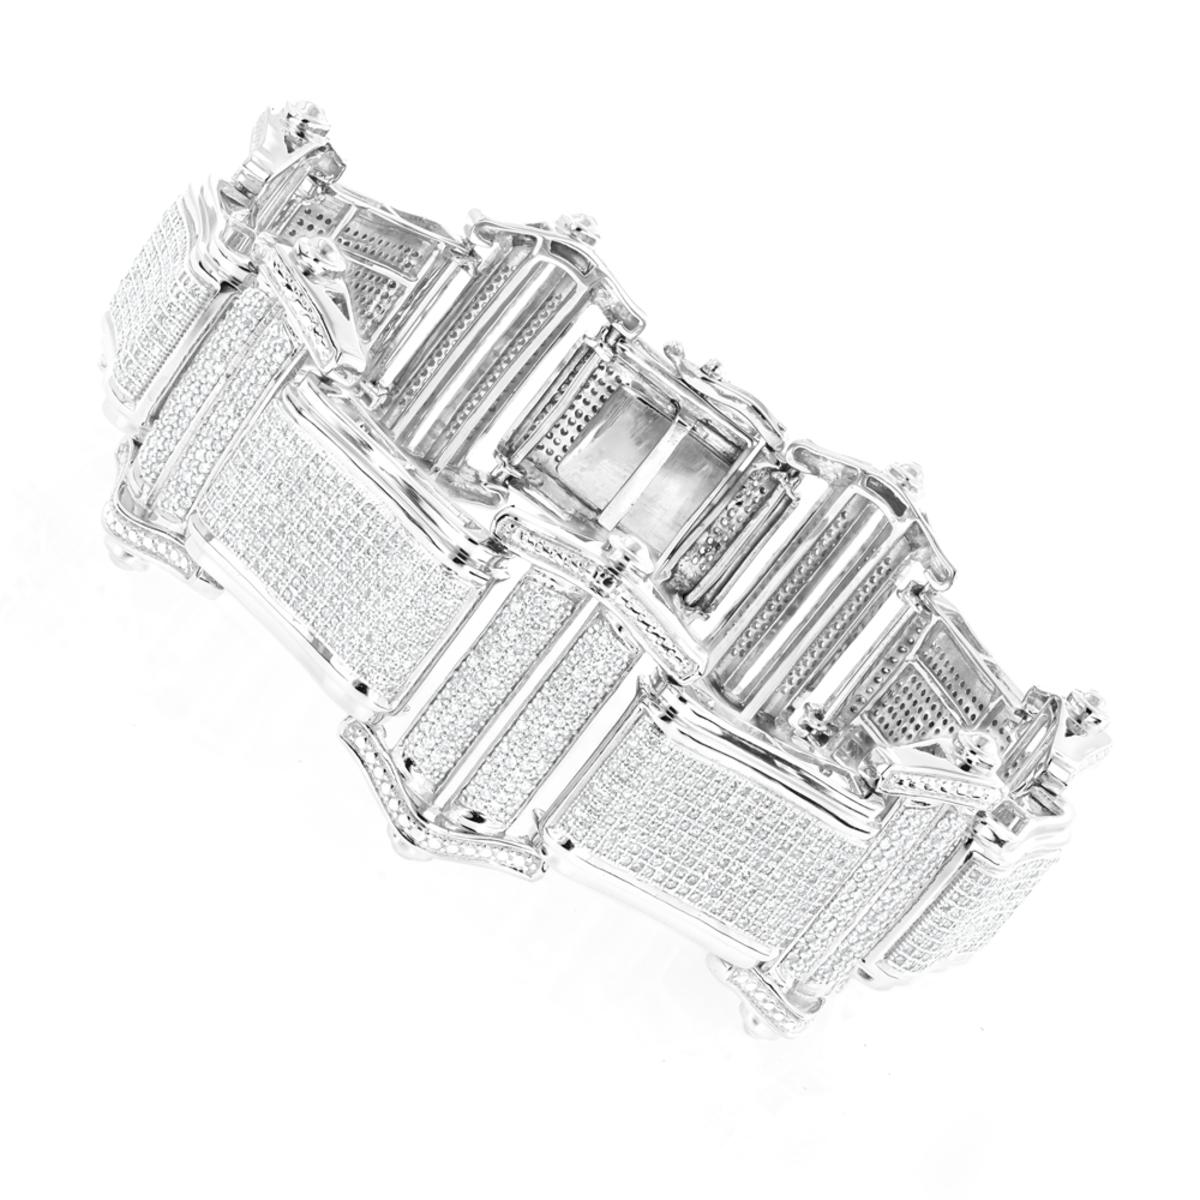 Mens Bracelets 14K Gold Mens Diamond Bracelet 7.98ct